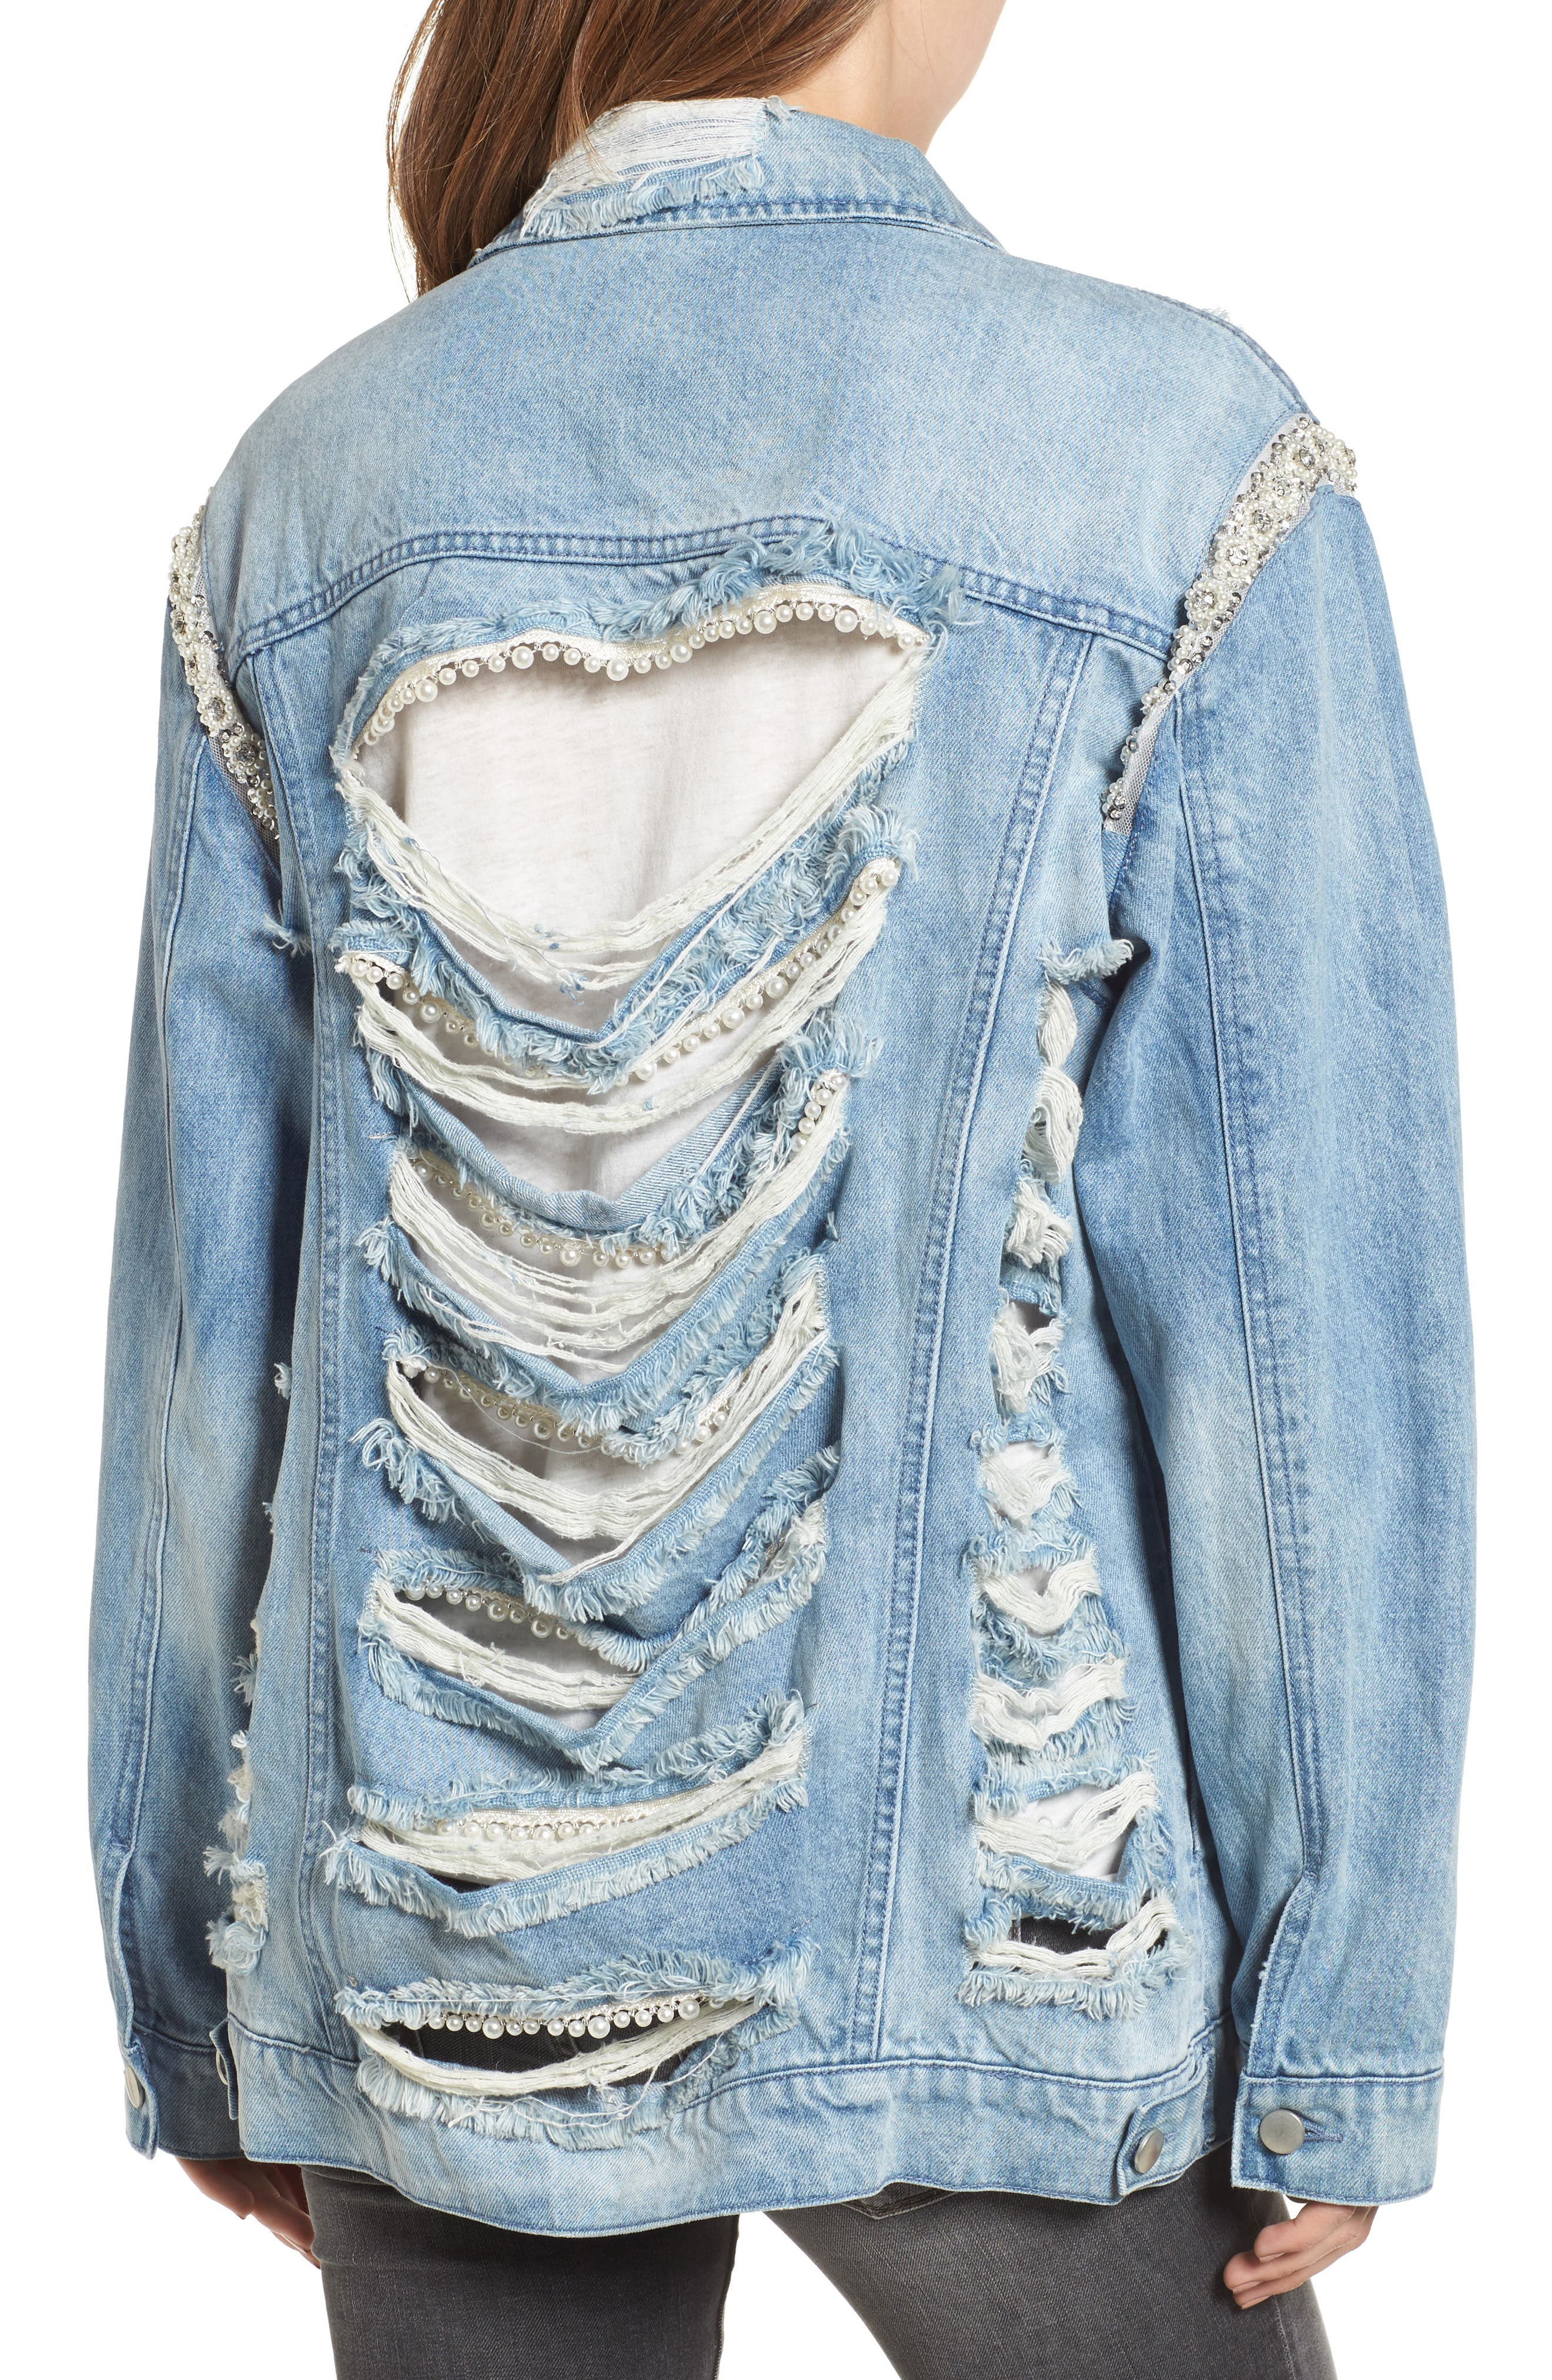 Main Image - Love, Fire Embellished Ripped Denim Jacket